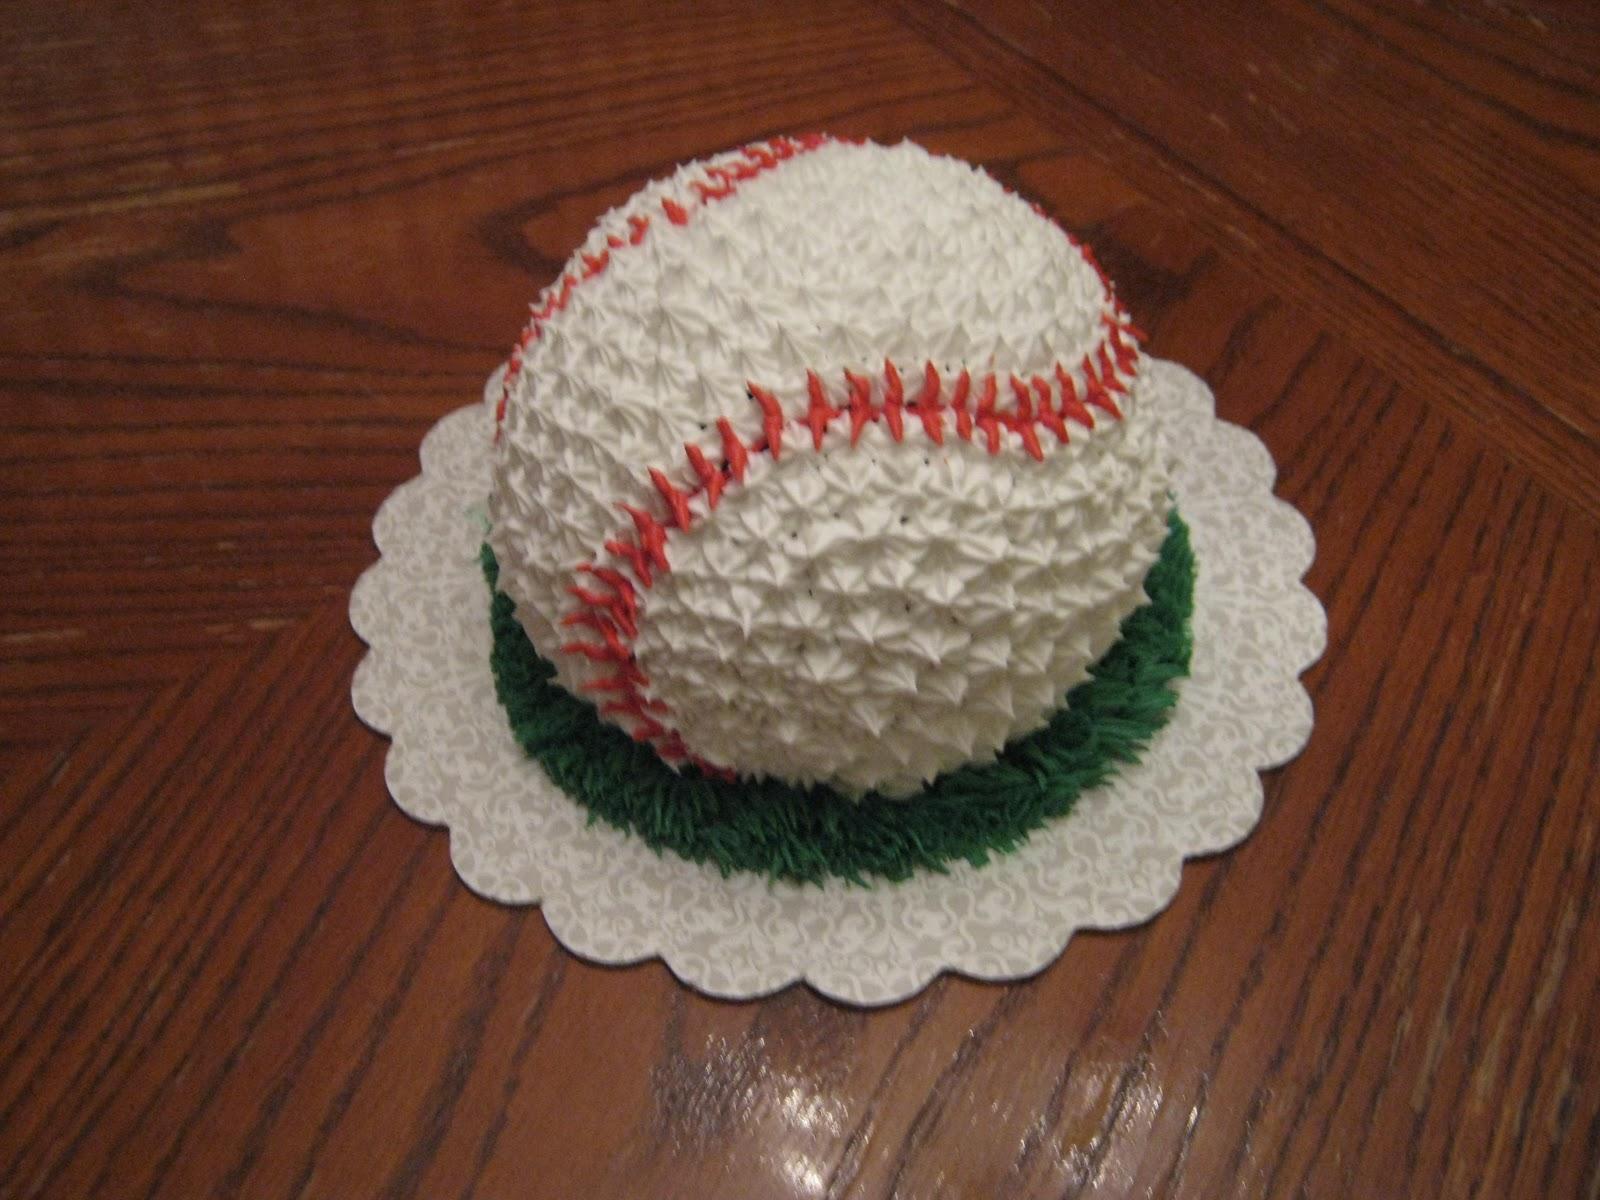 Cakes By The Sugar Cains Davids Softball Birthday Cake